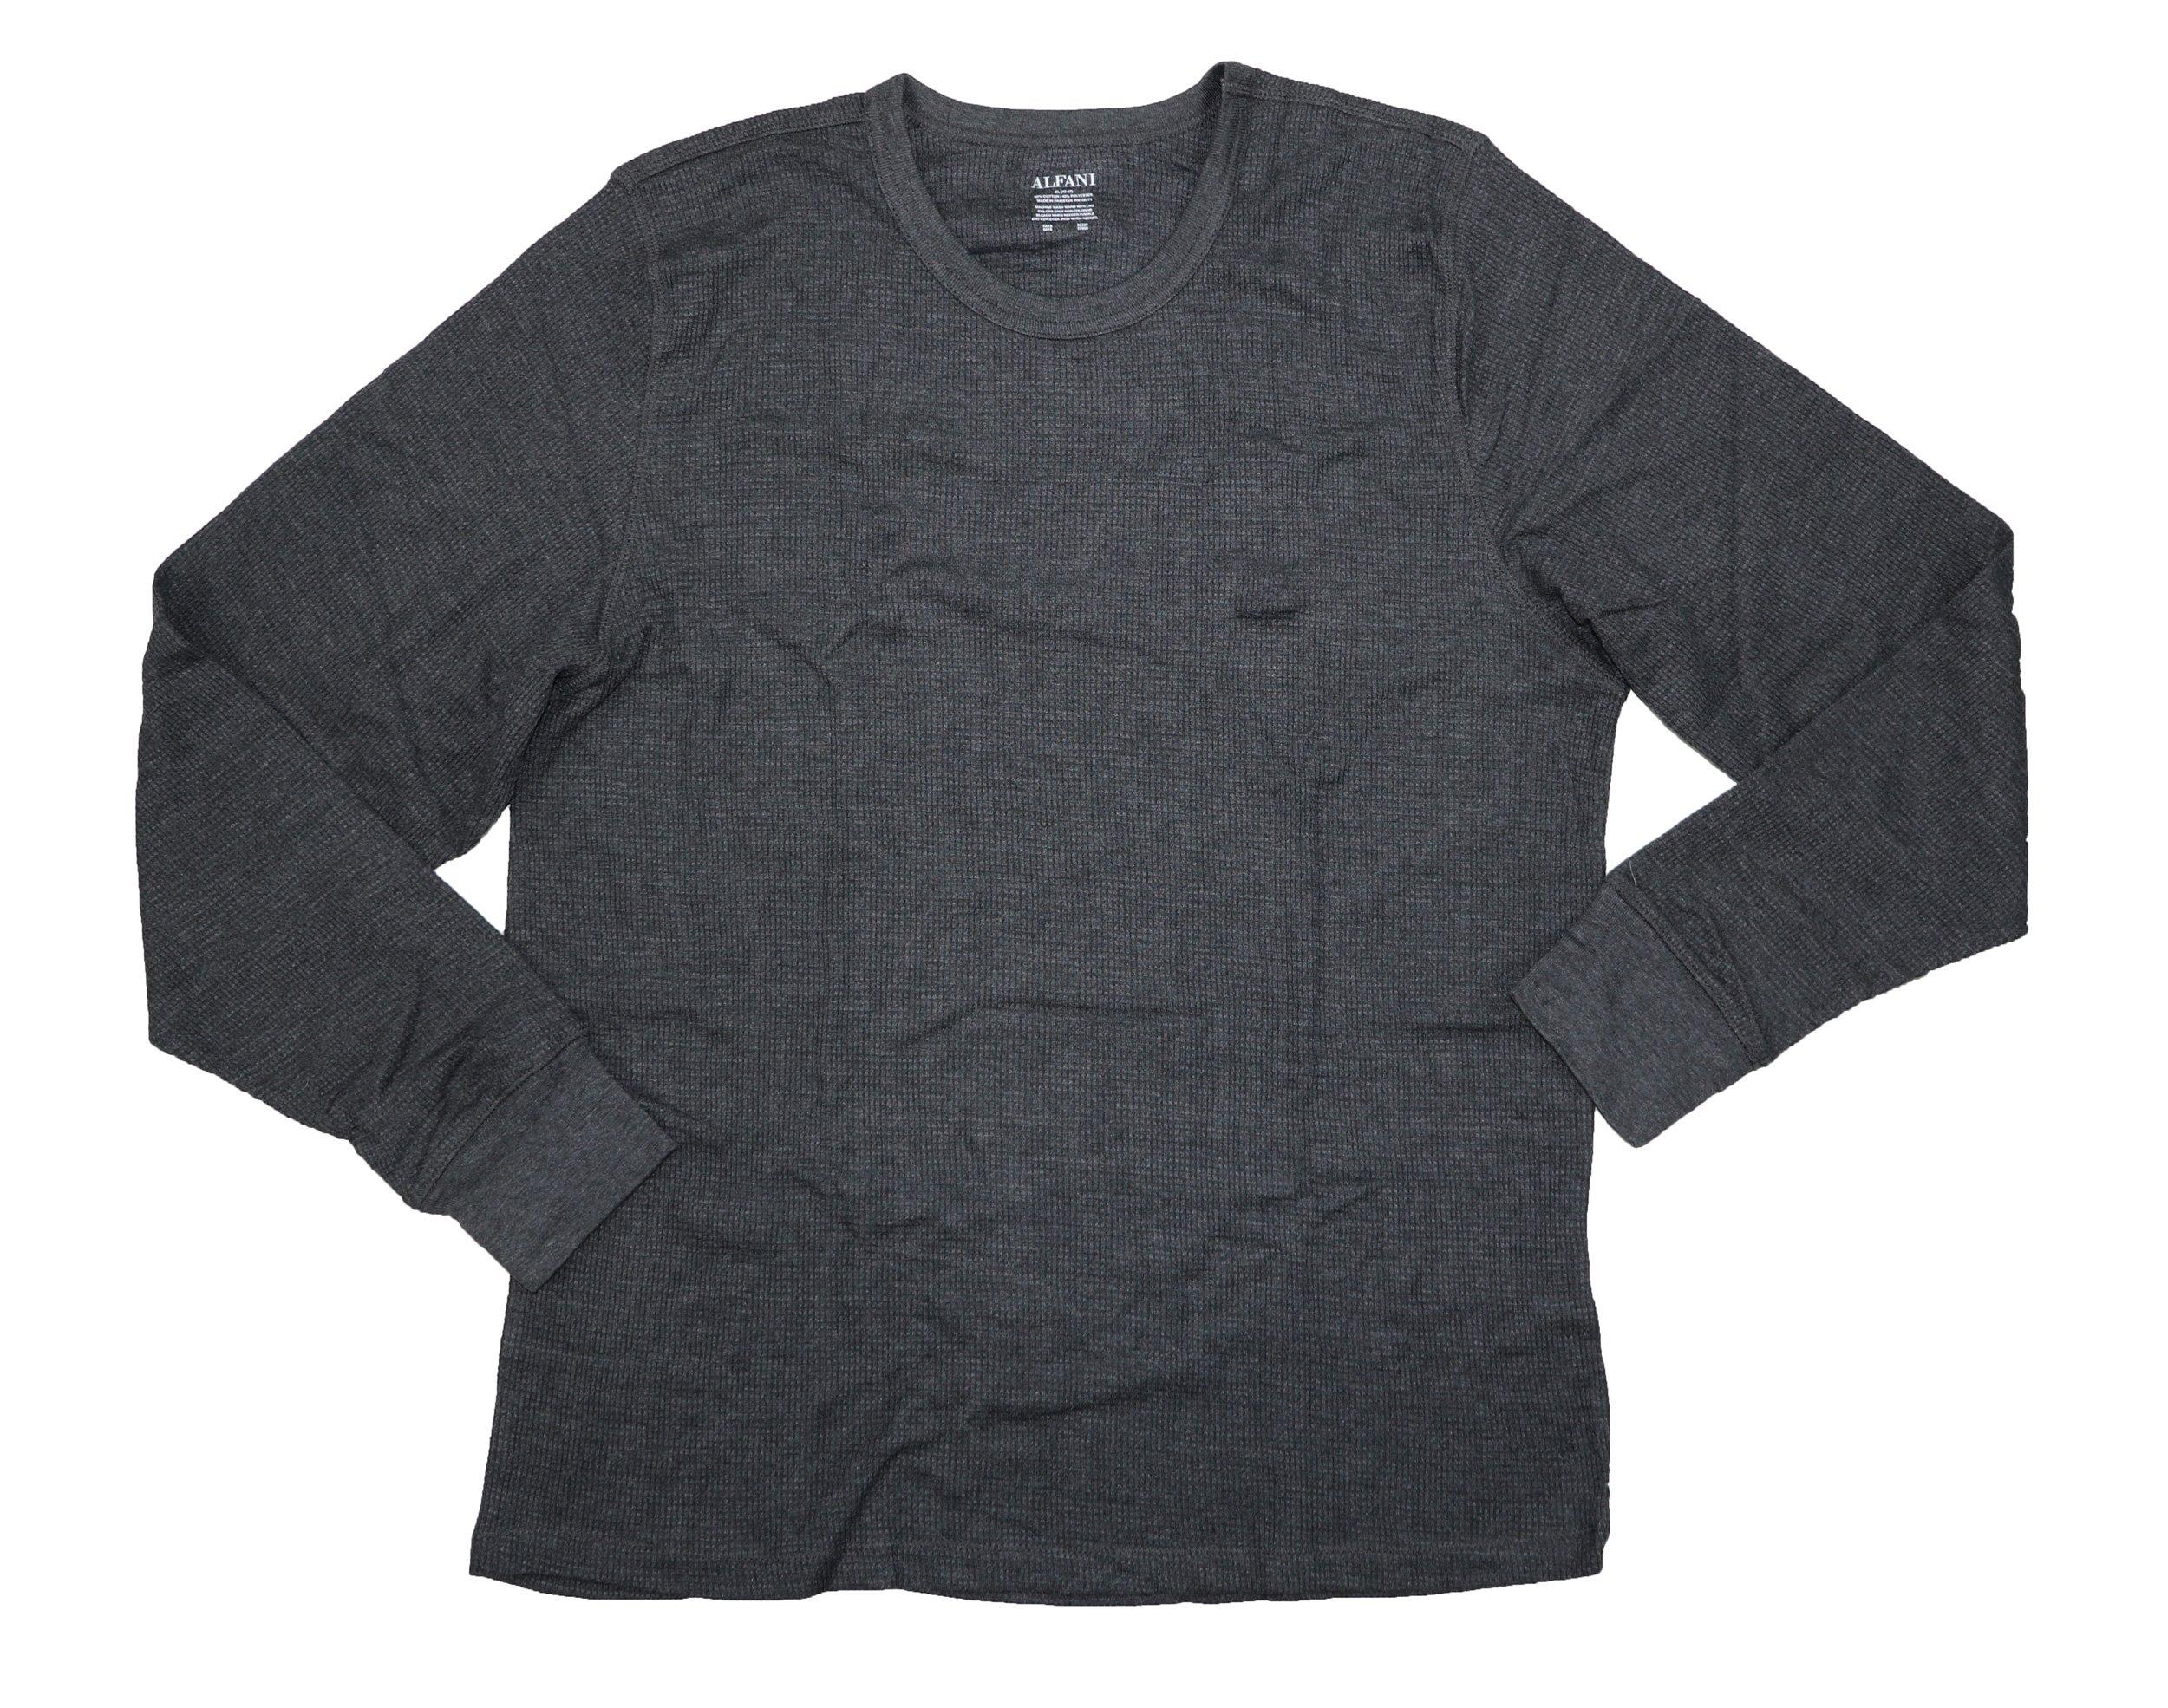 Alfani Men's Thermal Knit Waffle Base Layer Crew Neck Top Shirt, Charcoal, X-Large